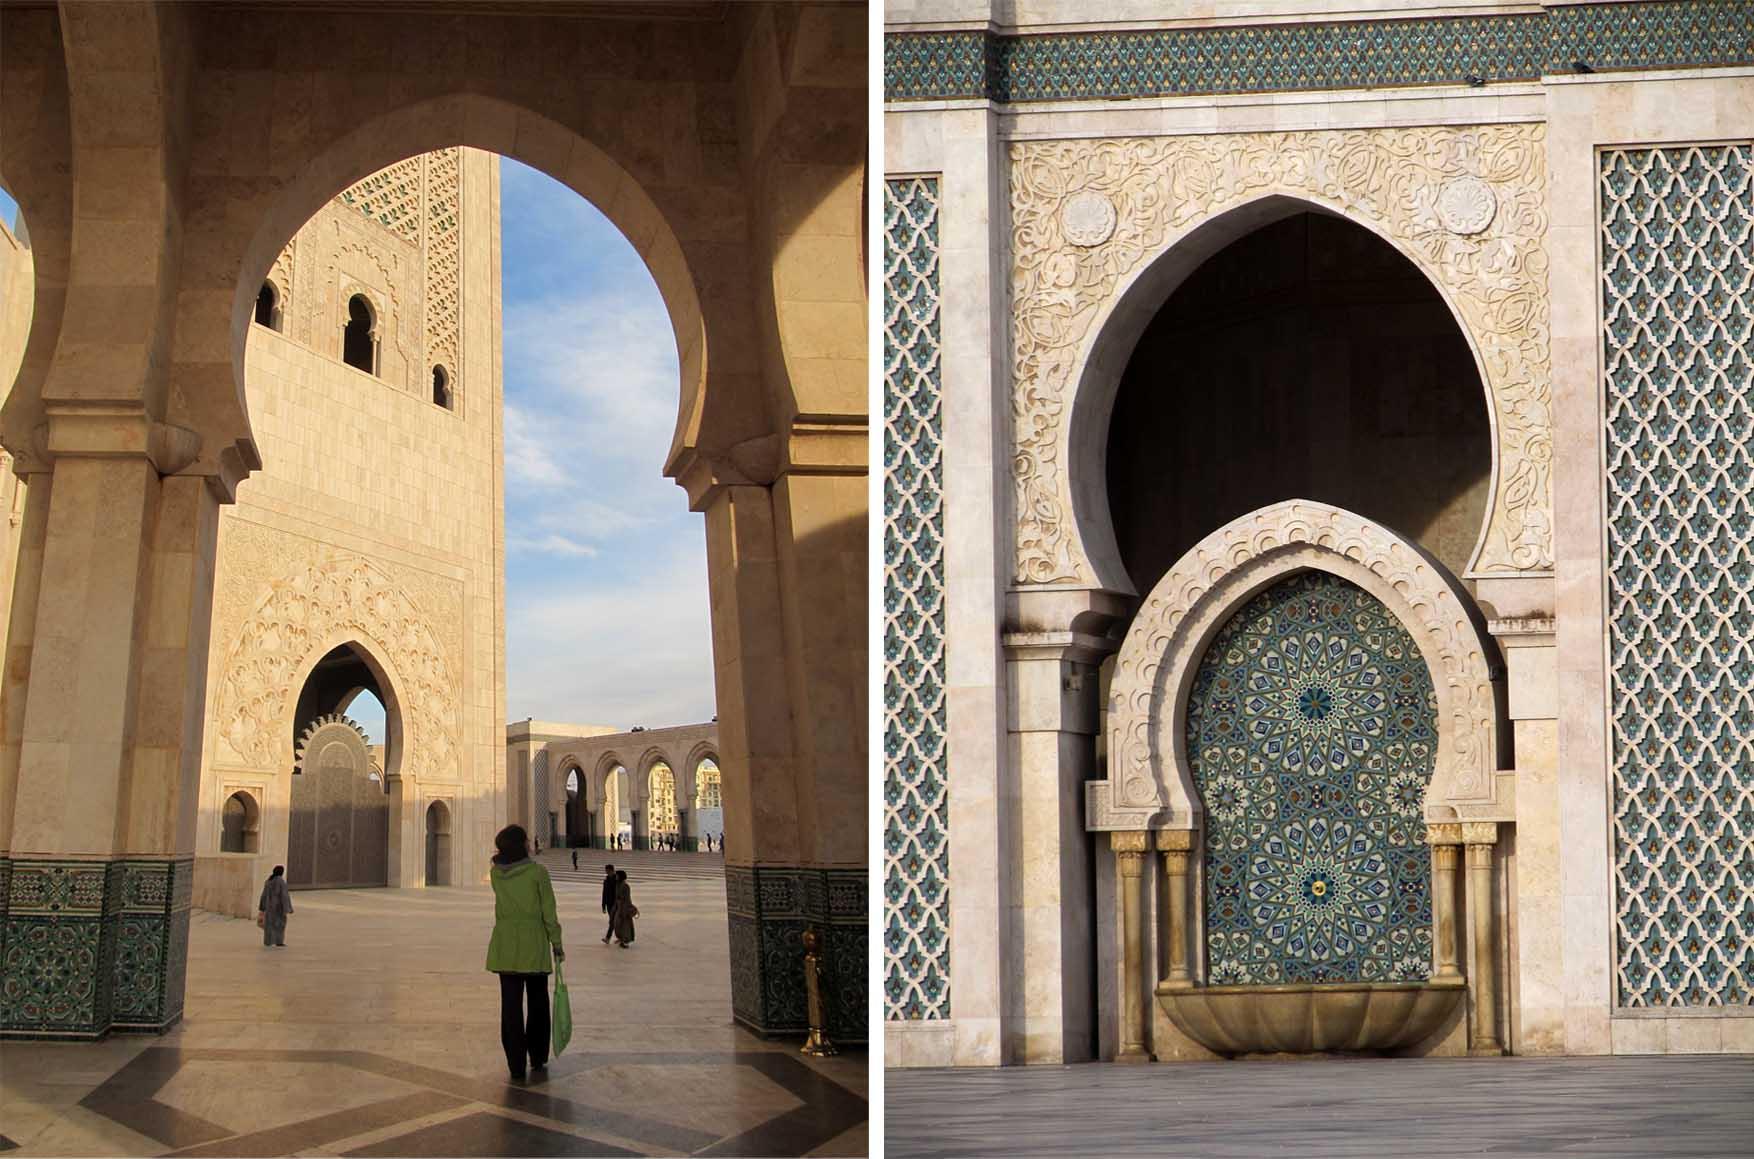 95 maroko kazablanka velika dzamija